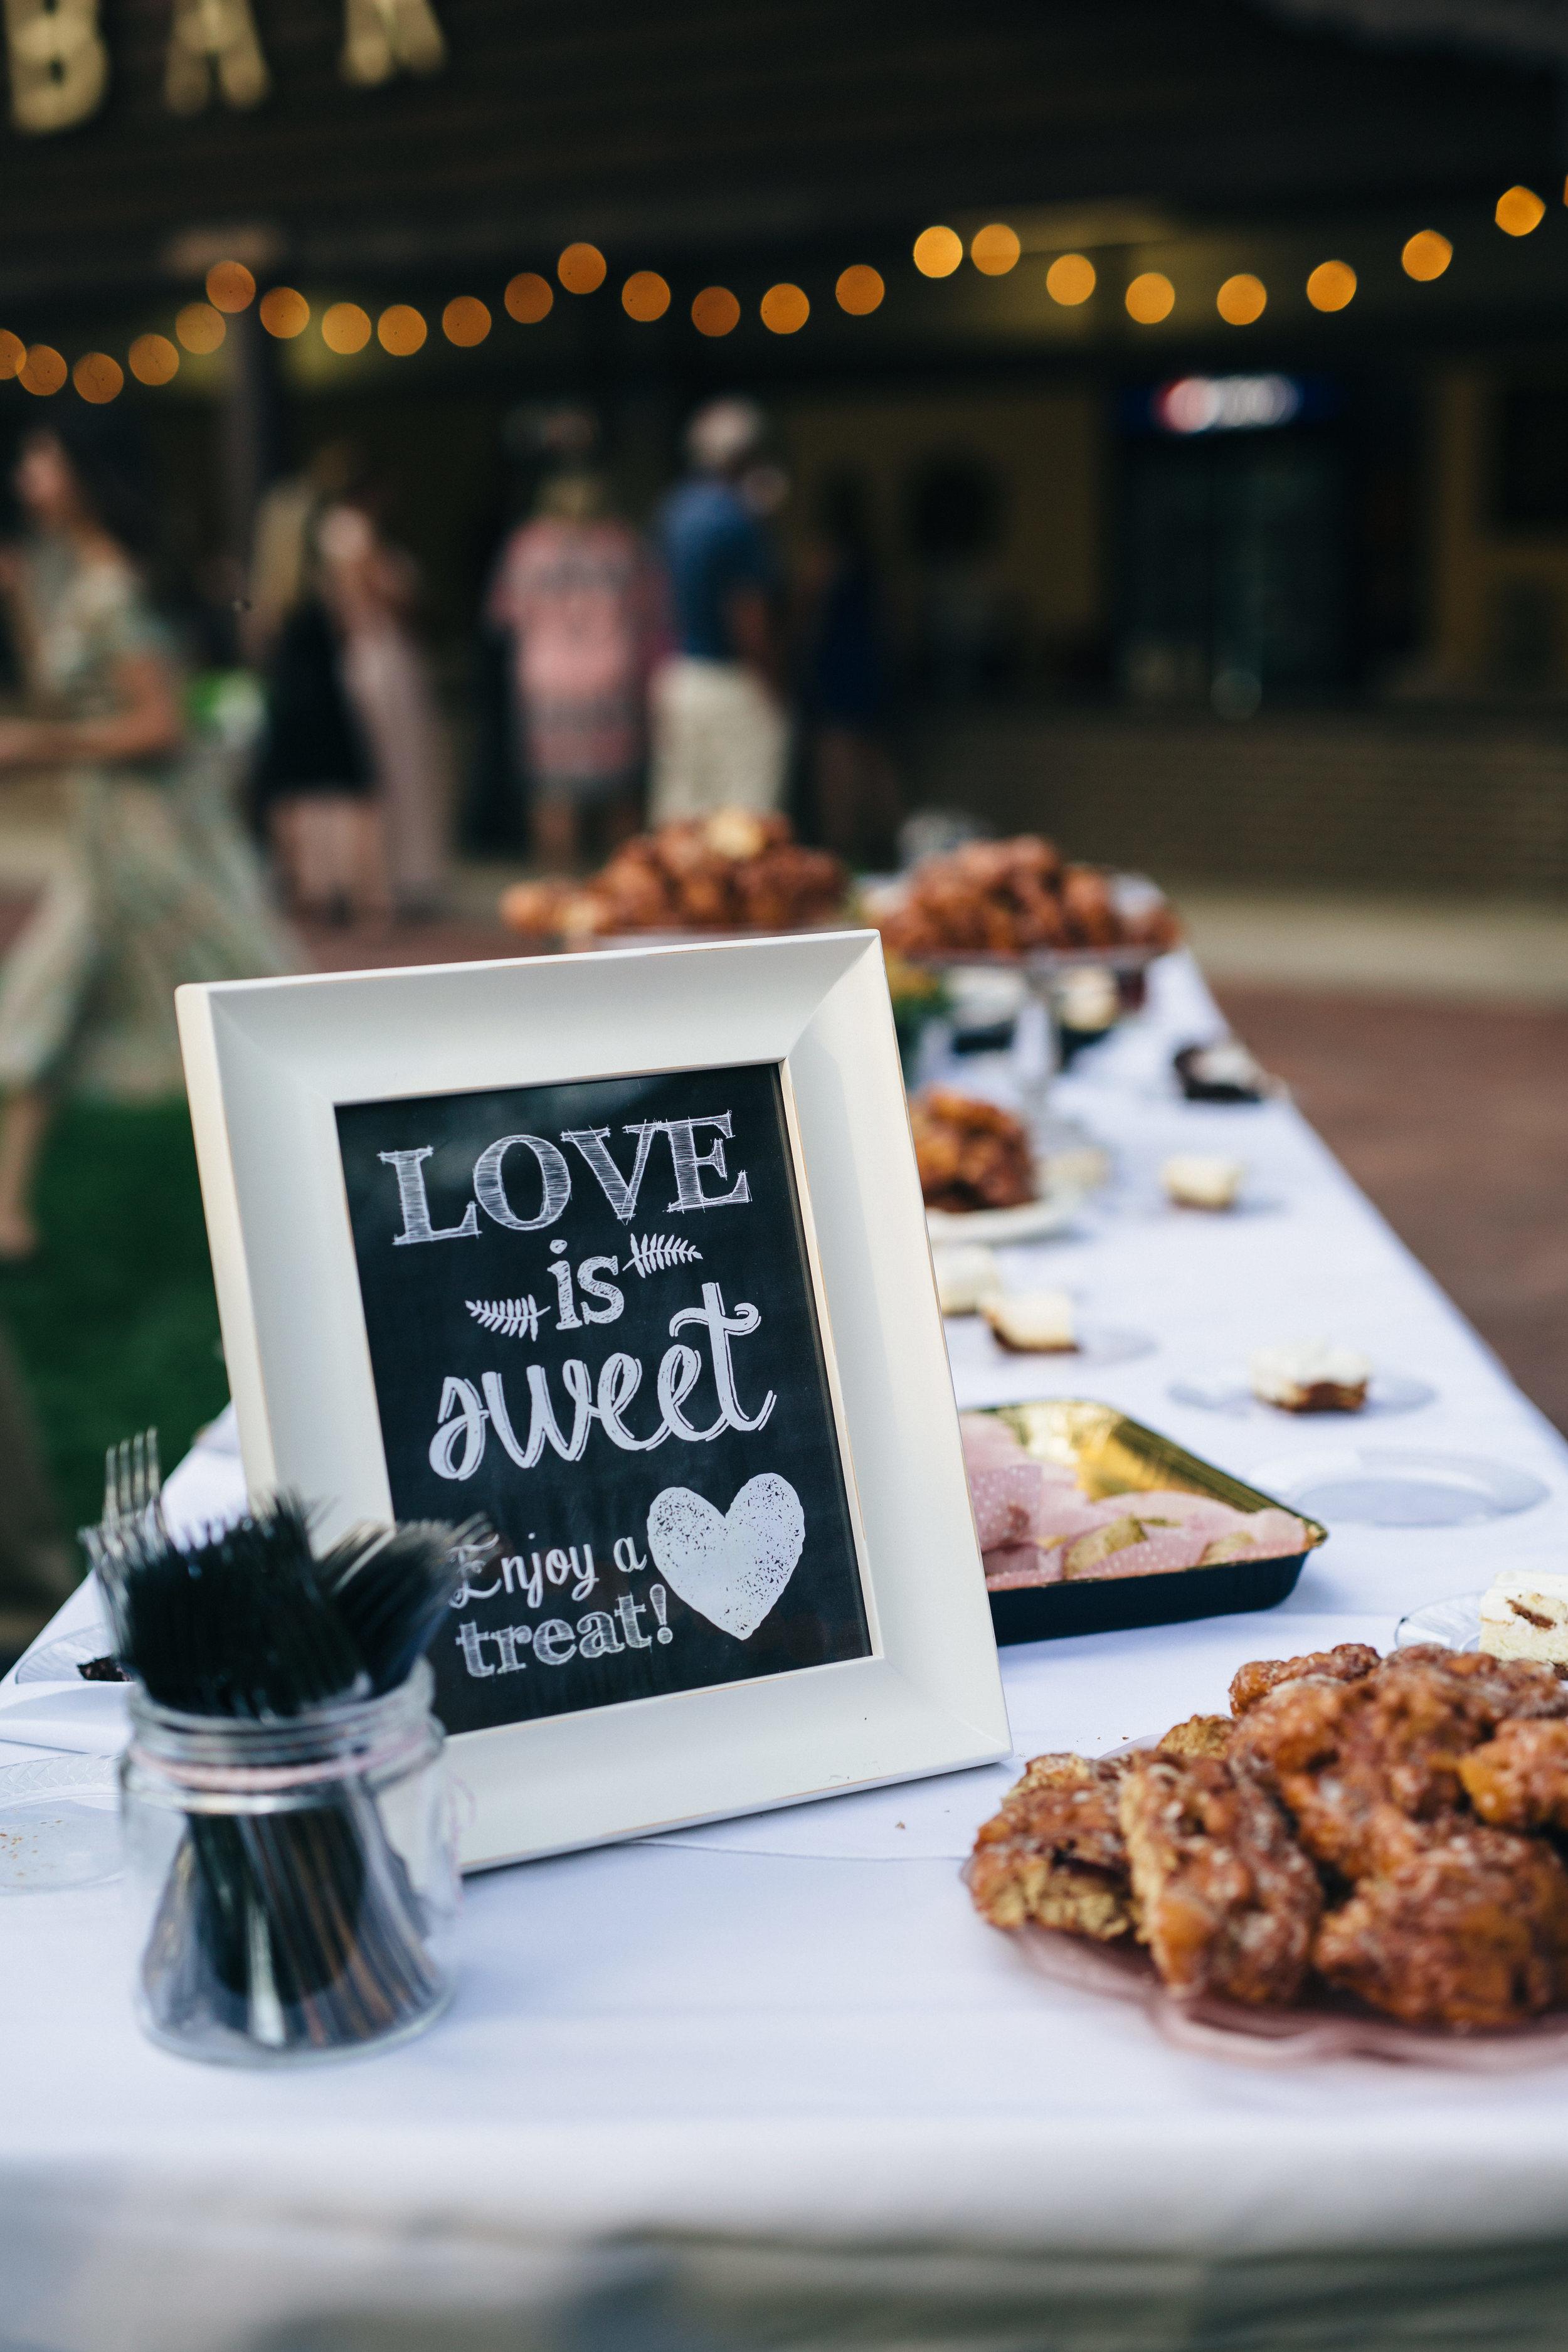 Dessert table at outdoor wedding reception.